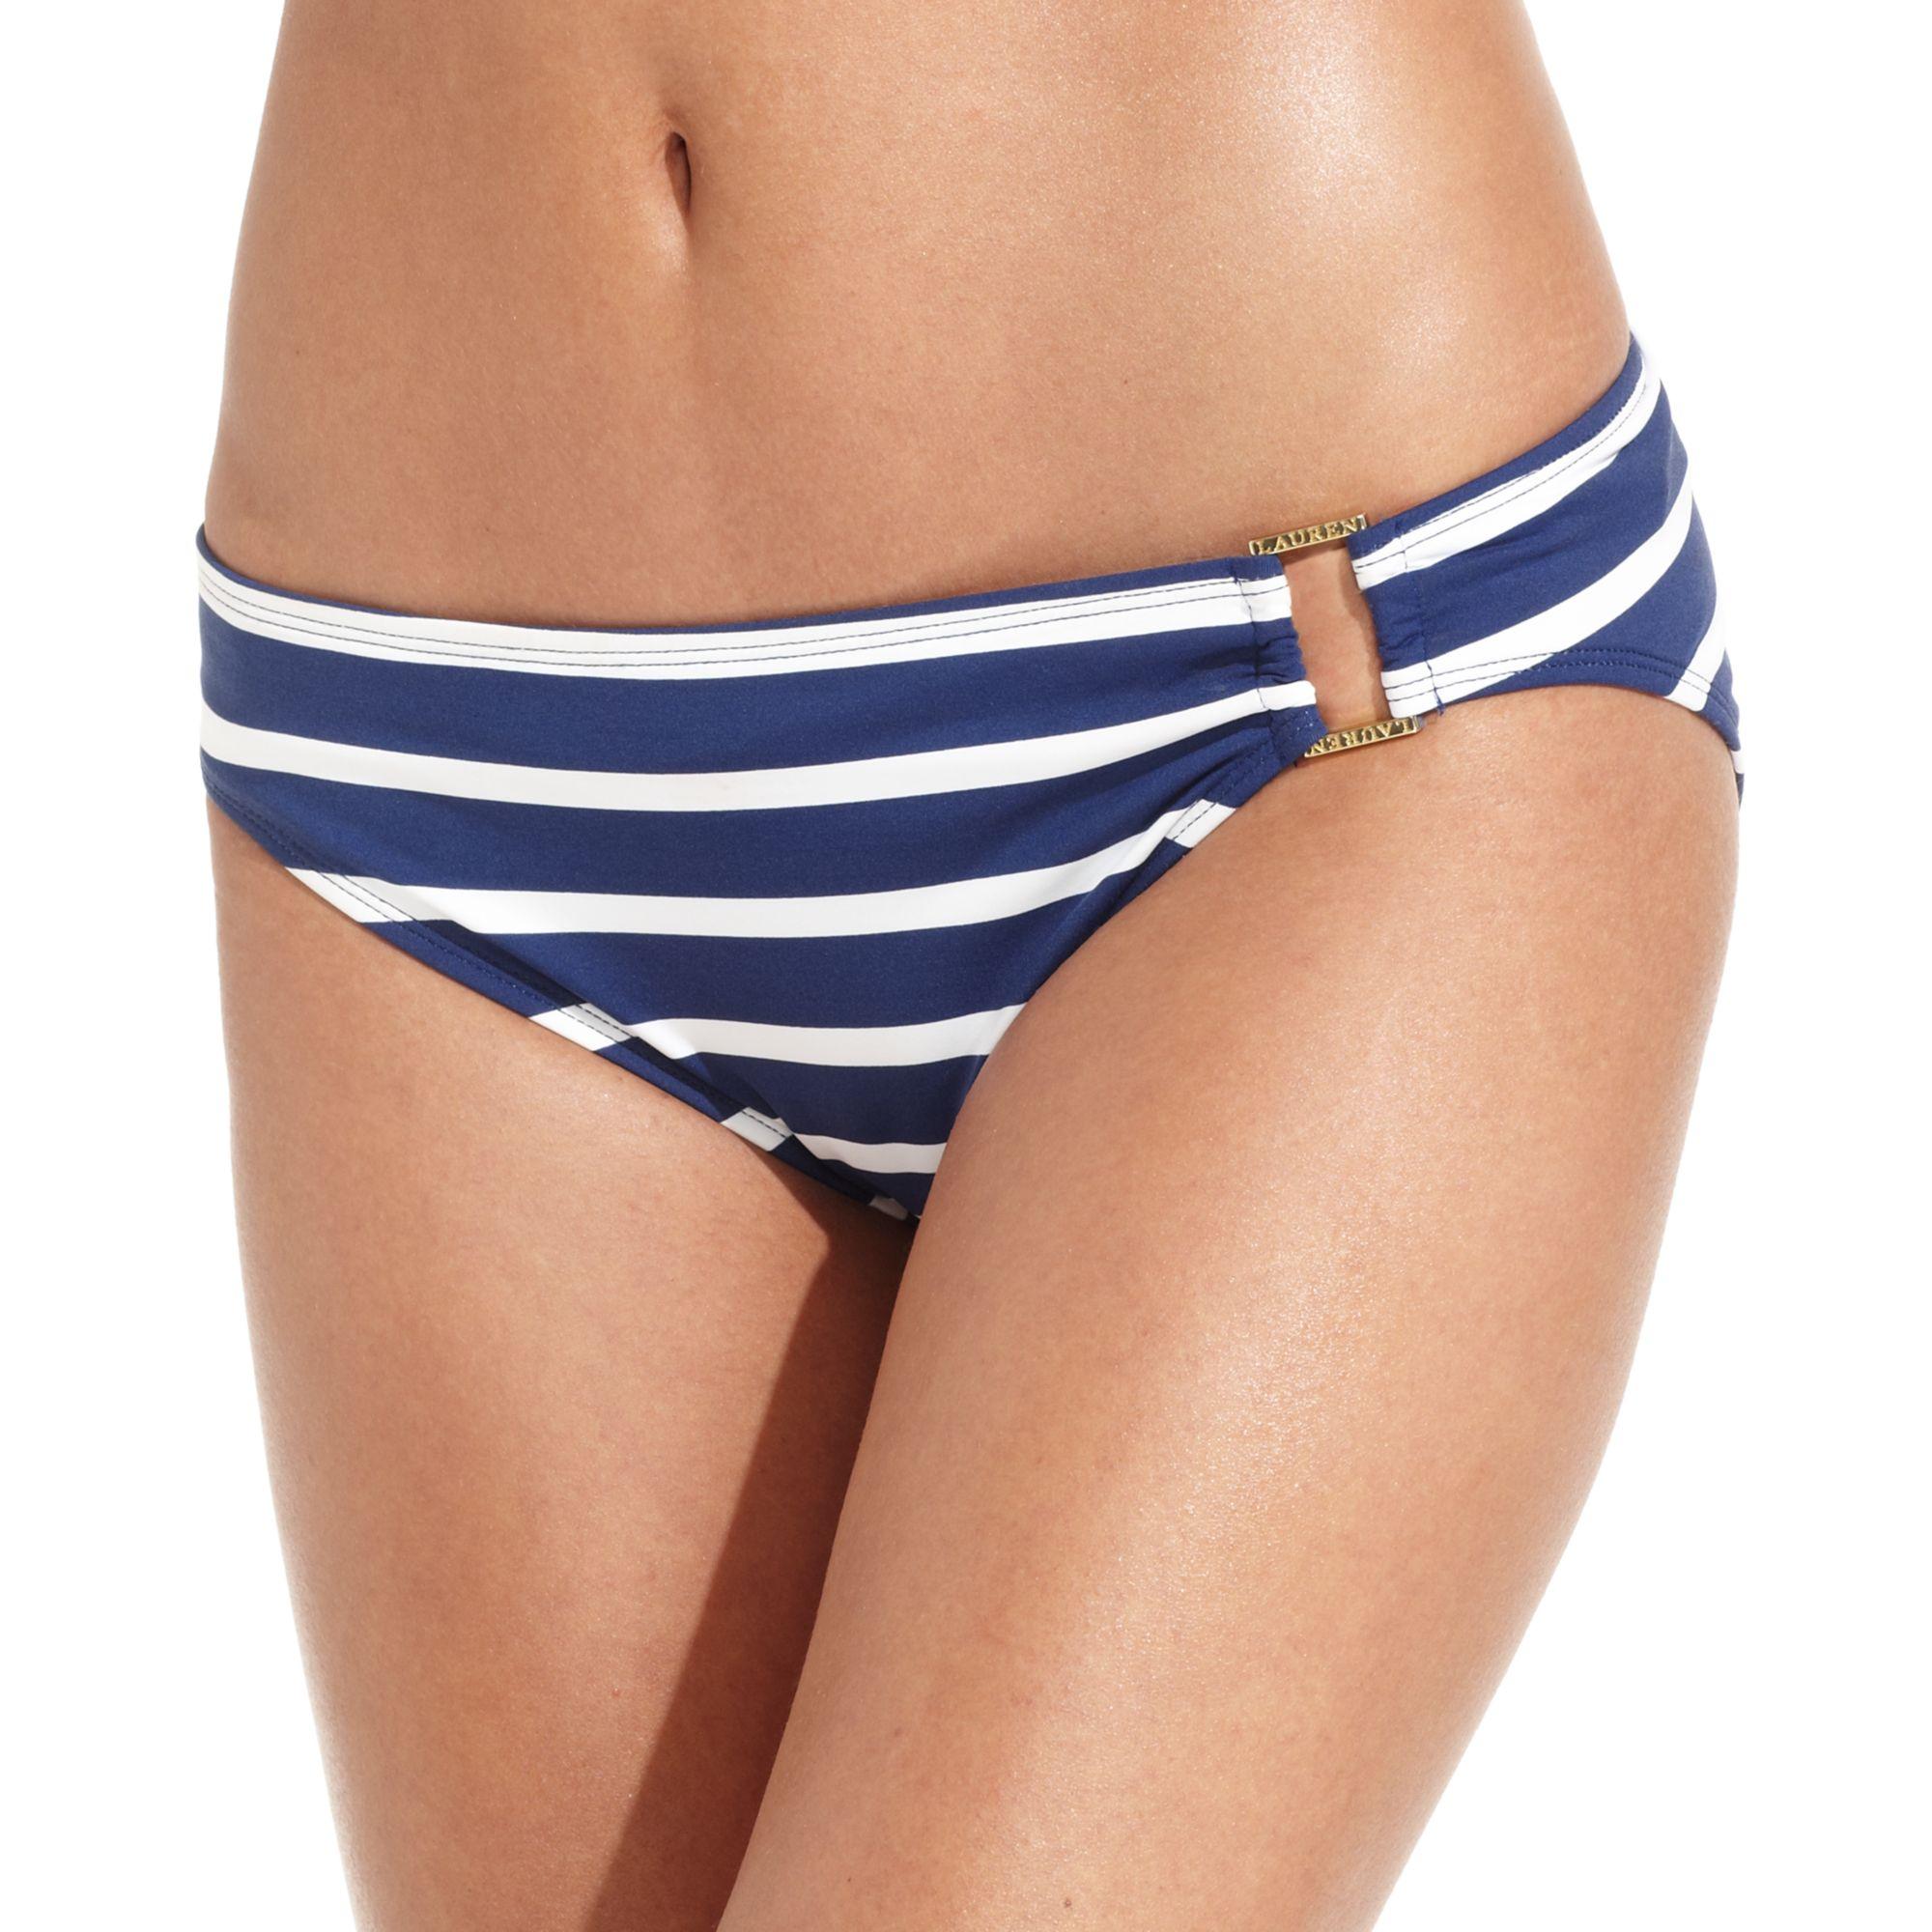 20c6dc902d535 Lyst - Lauren by Ralph Lauren Striped Buckle Hipster Bikini Bottom ...